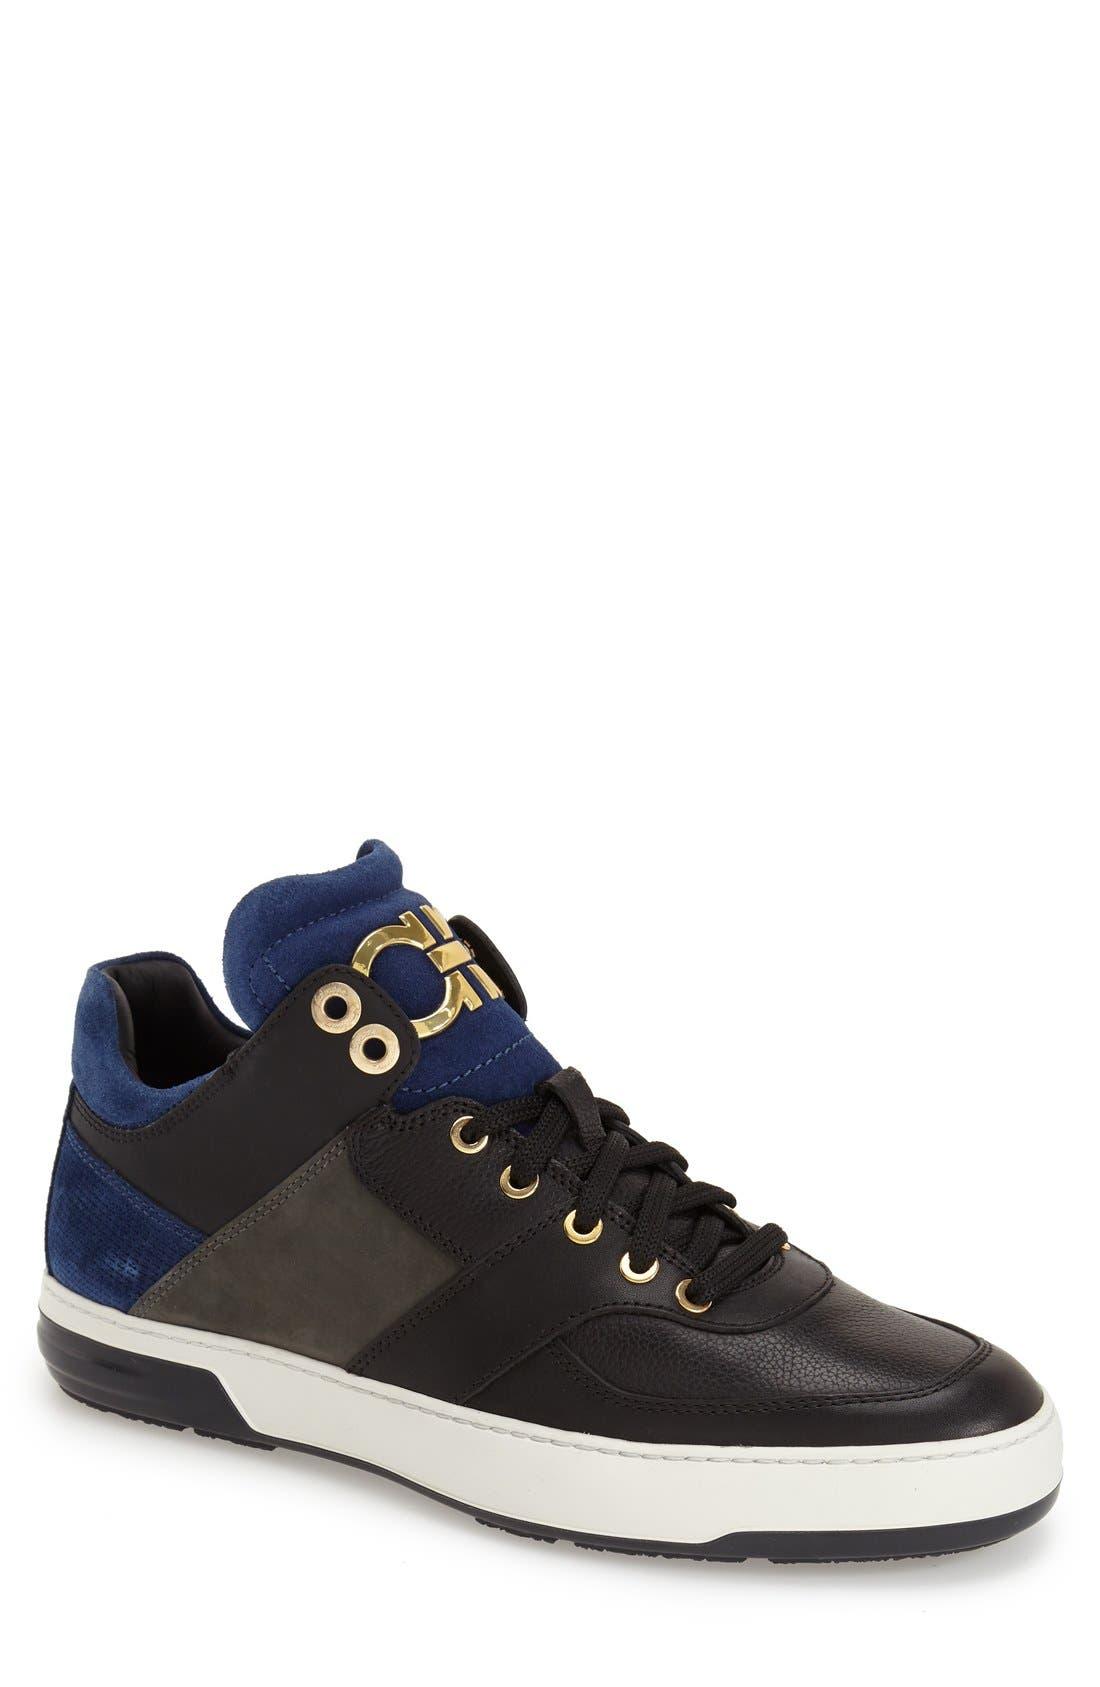 'Monroe' Sneaker, Main, color, 004